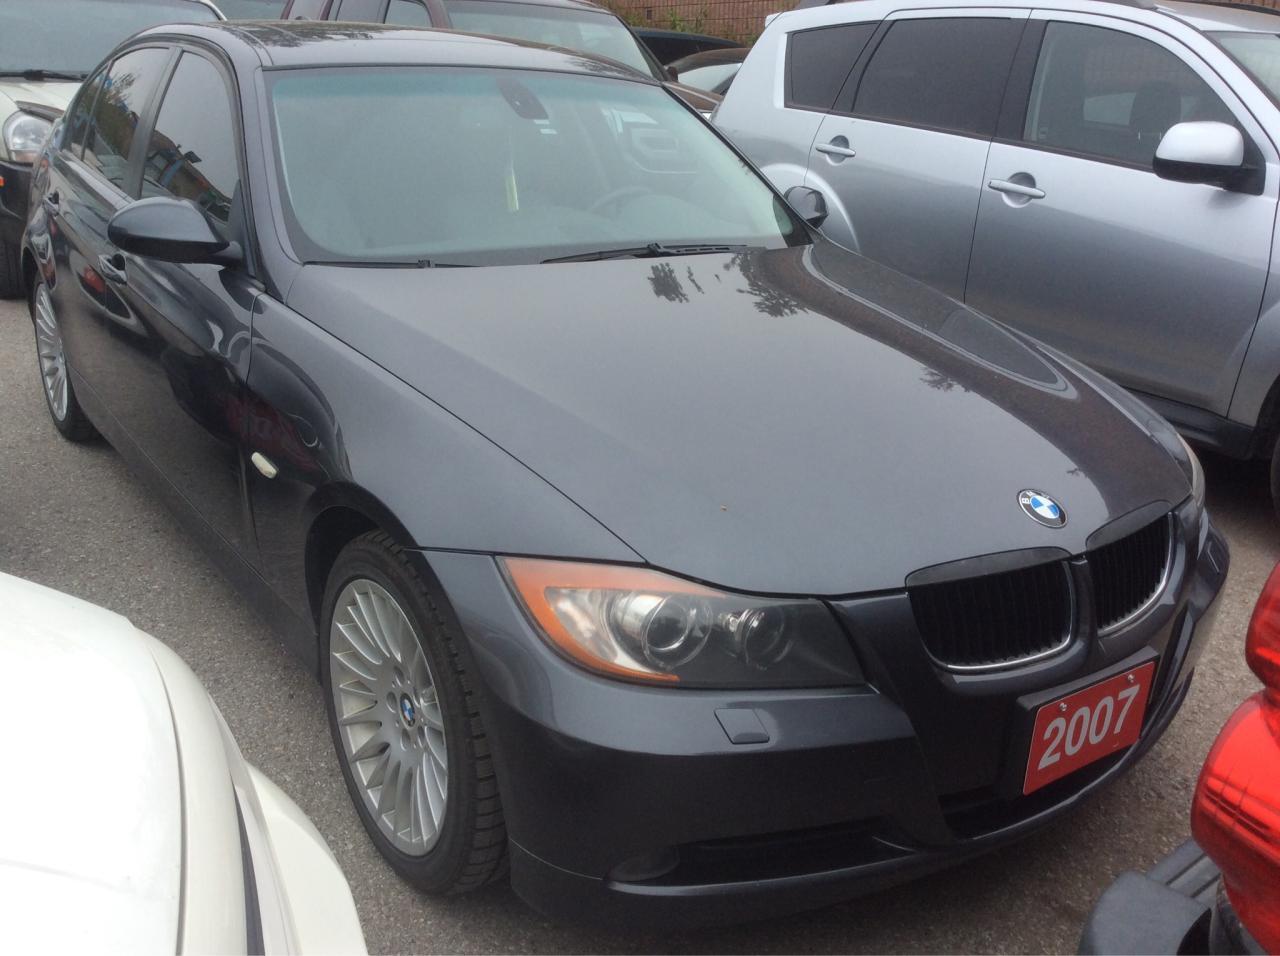 2007 BMW 3 Series 328xi w/NAVI